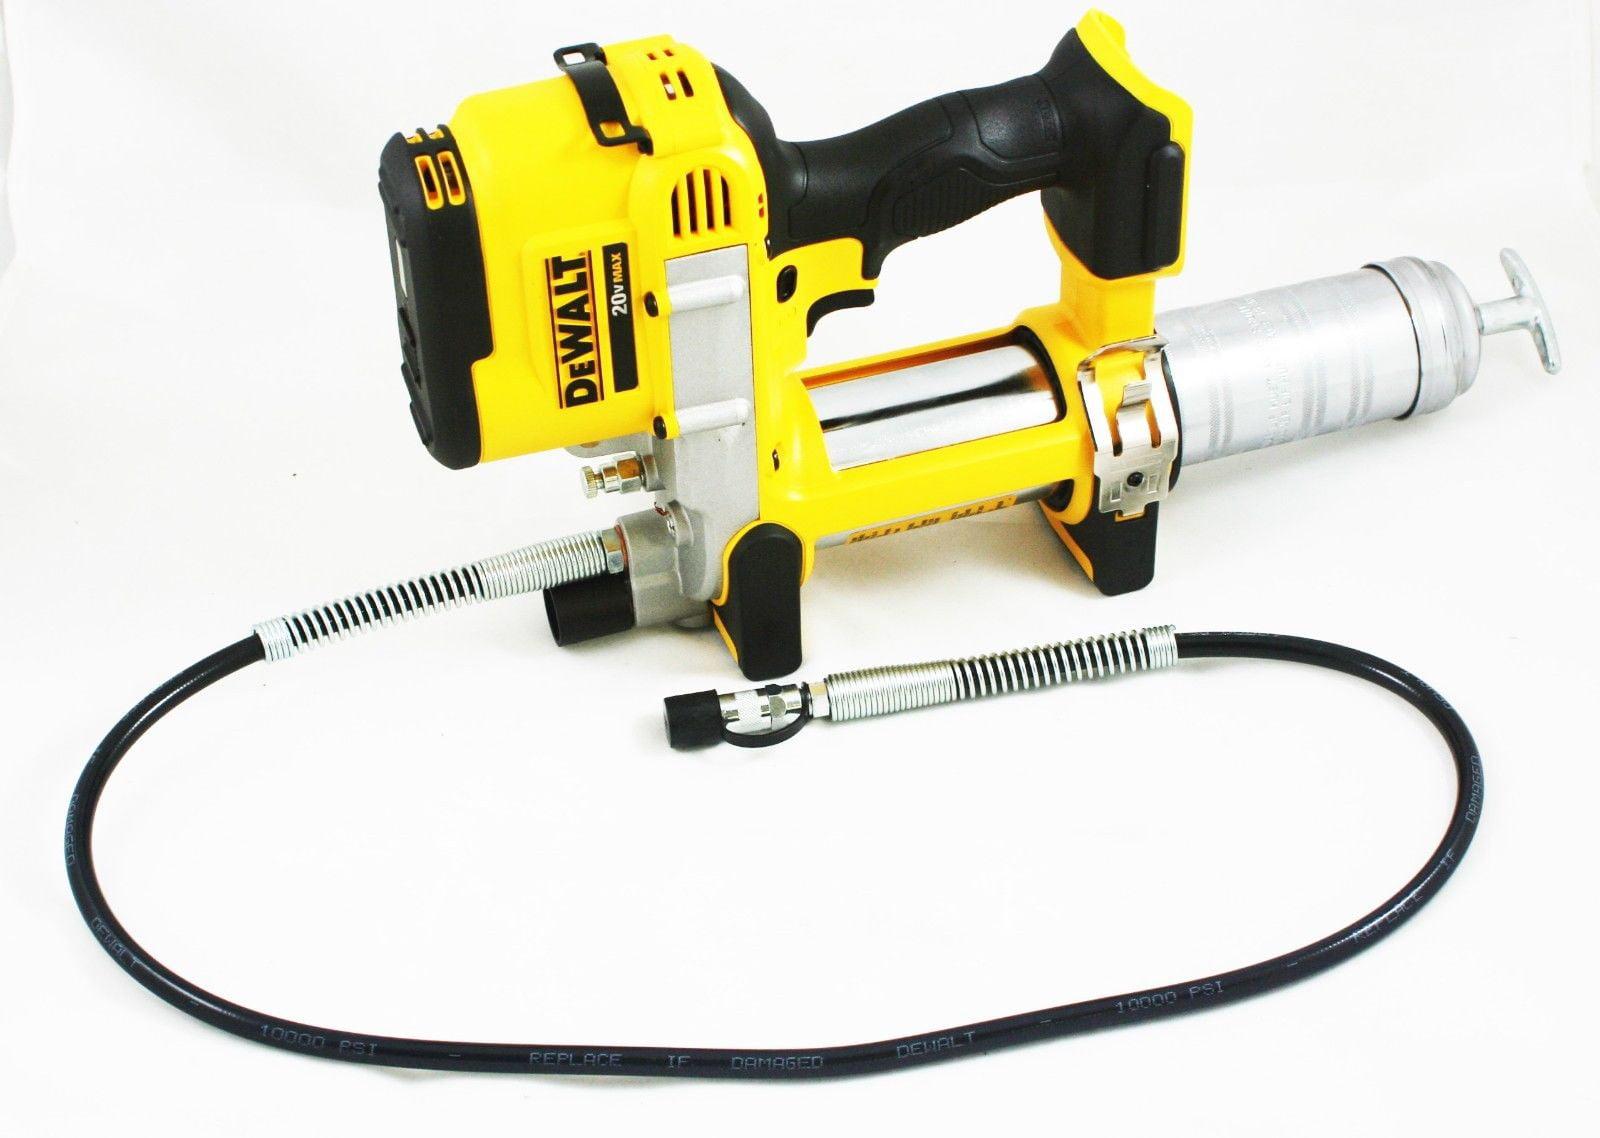 Bare Tool DCGG571B DeWalt 20V MAX Cordless Lithium-Ion Grease Gun